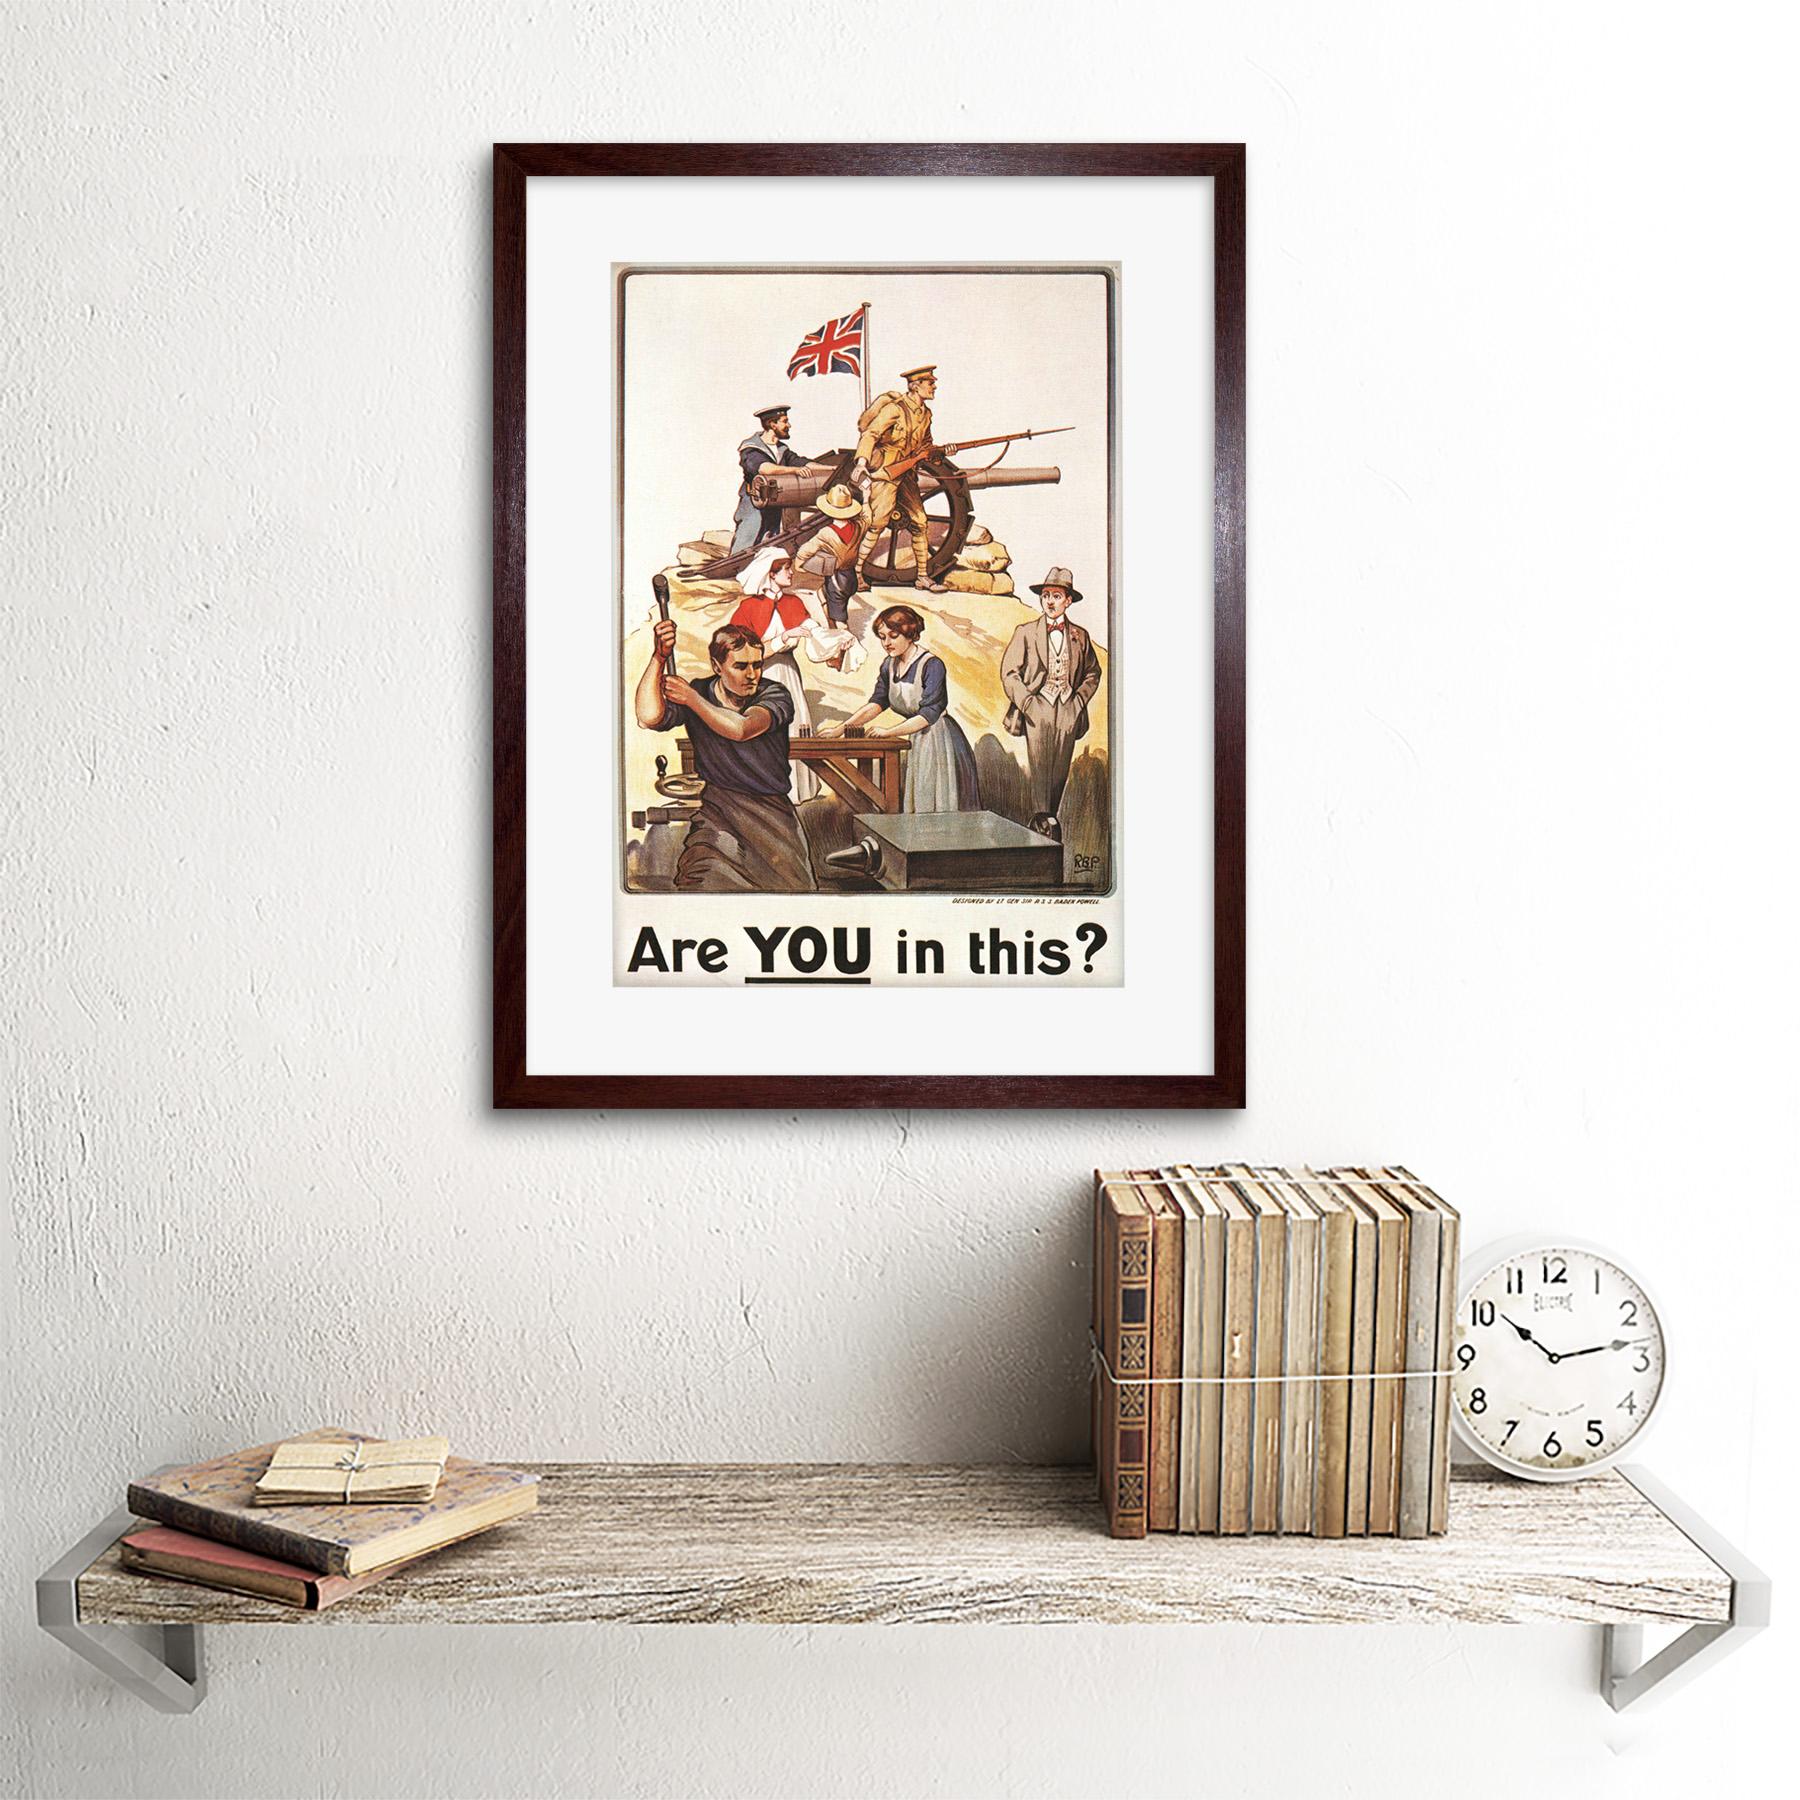 War First World Enlist Recruit UK Ad Framed Art Print Picture Mount 12x16 Inch